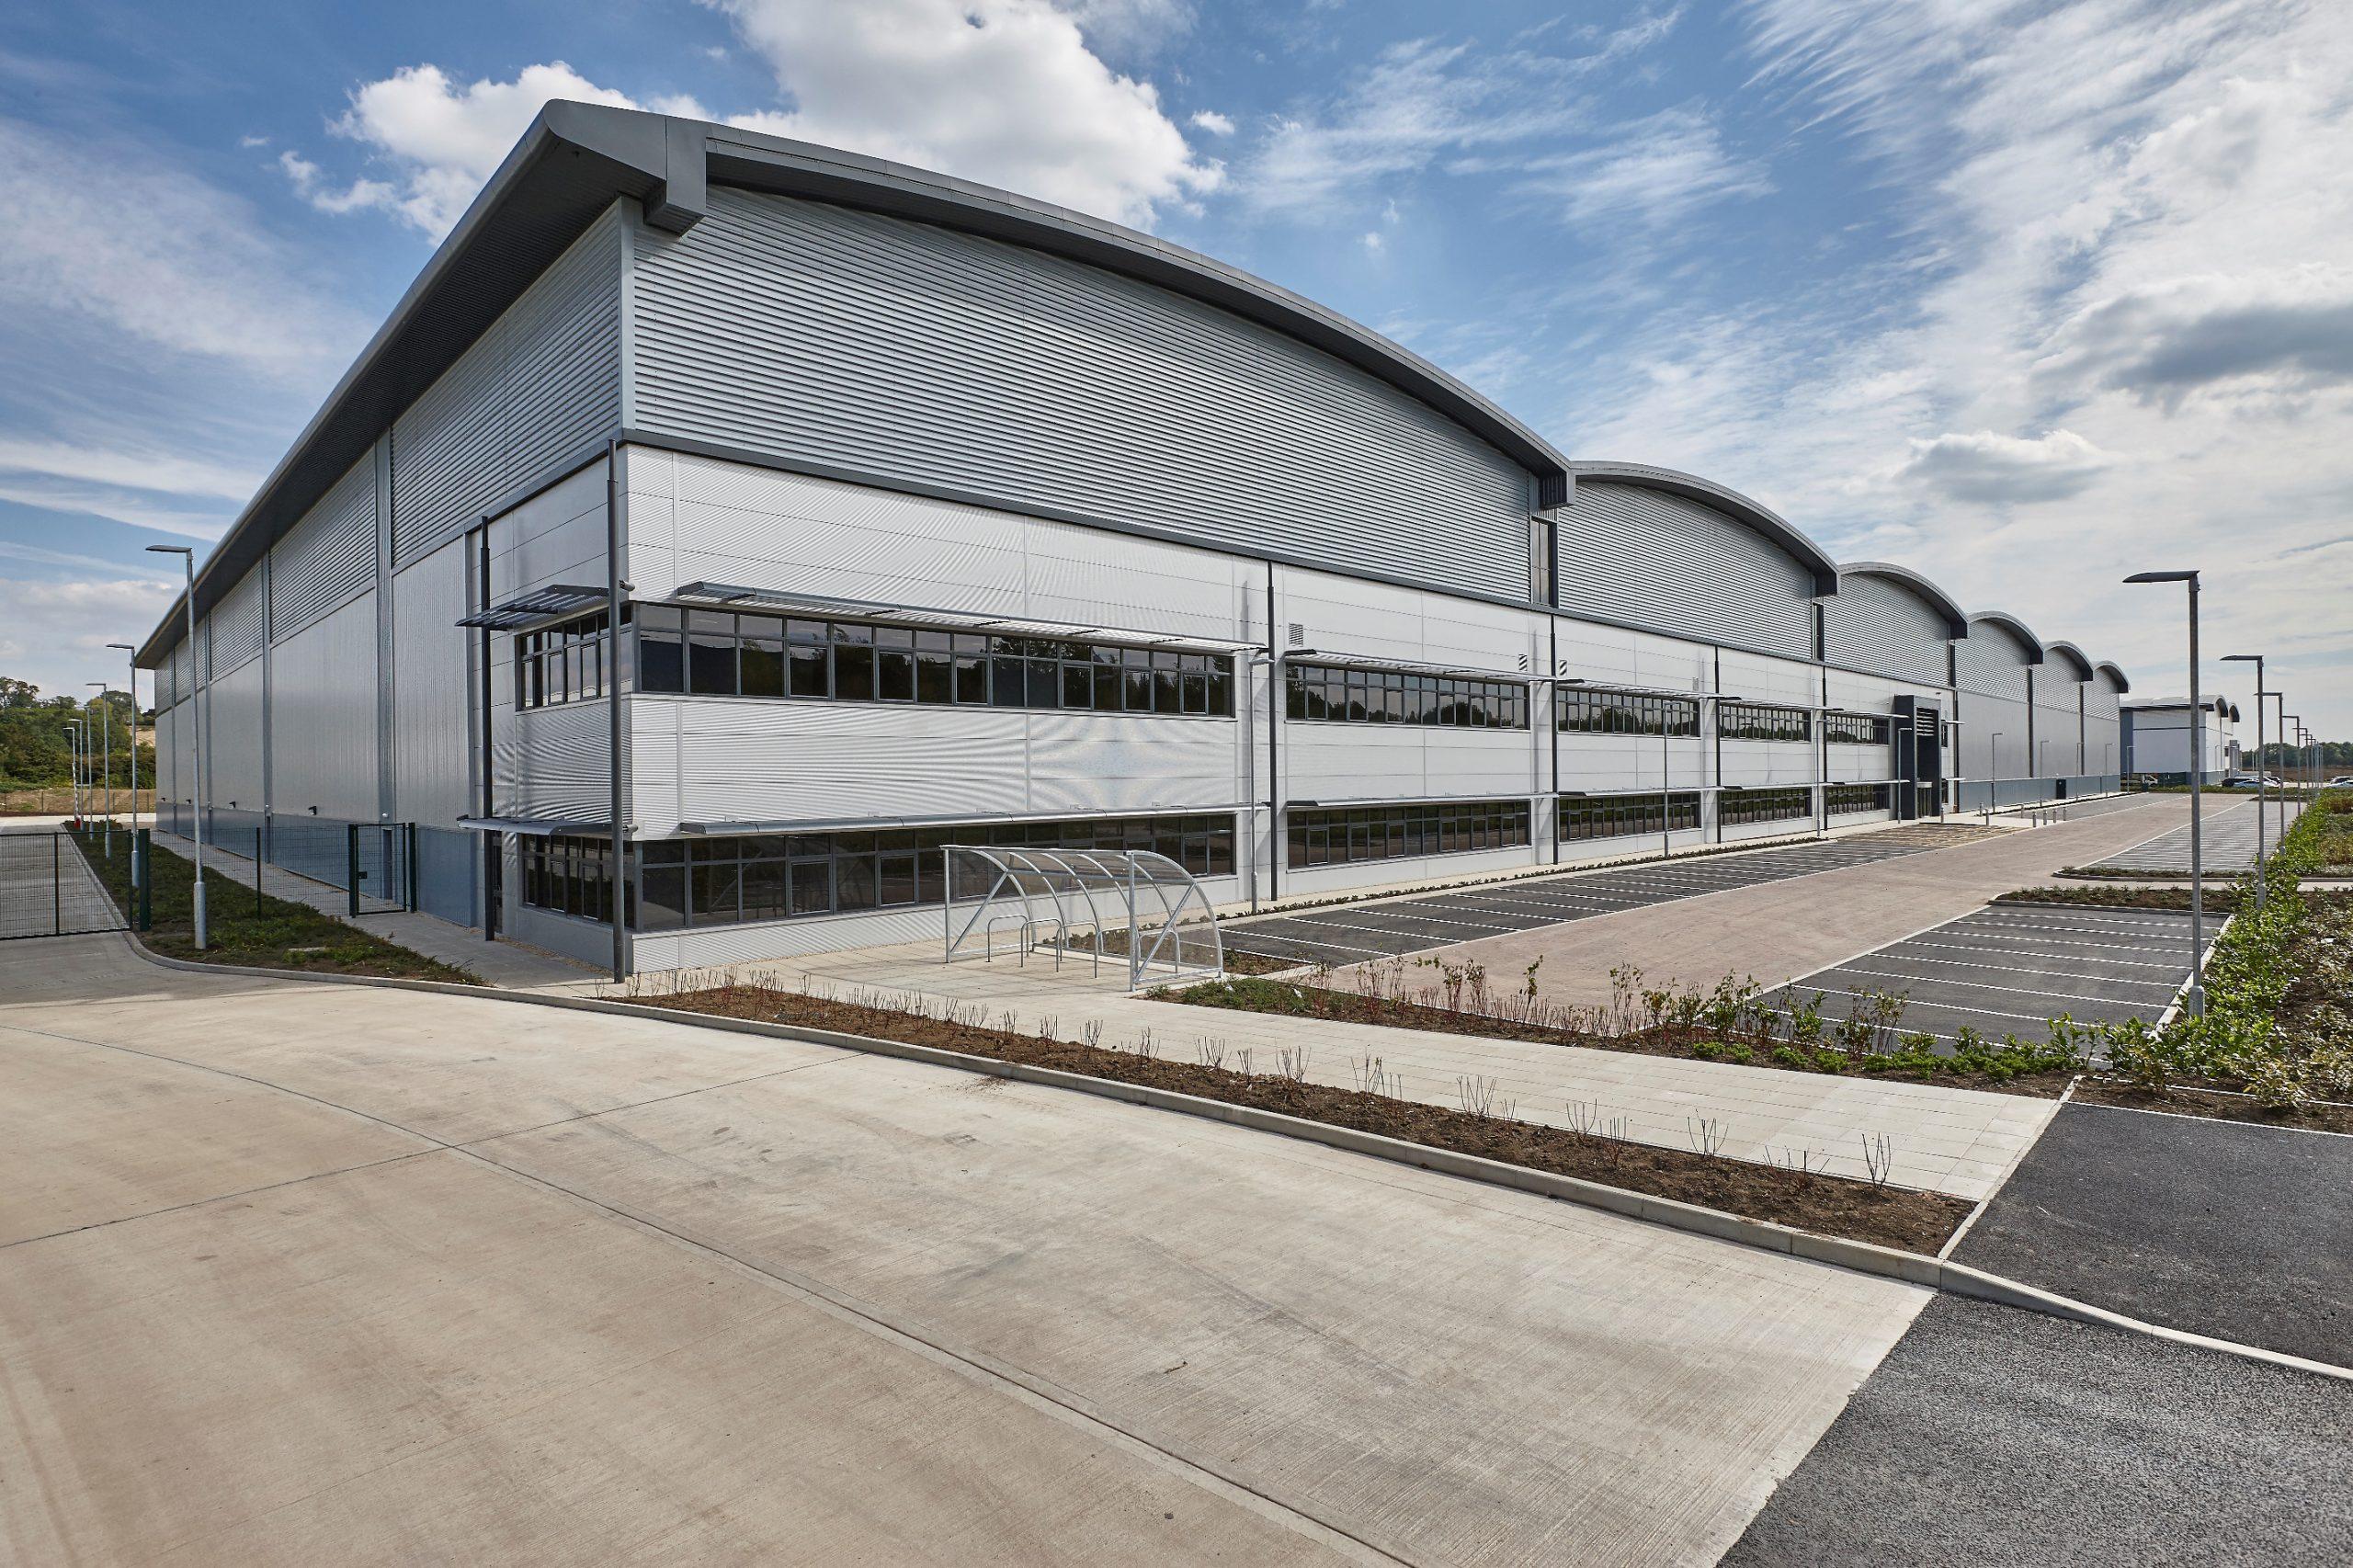 HelloFresh moving into new distribution centre in Banbury